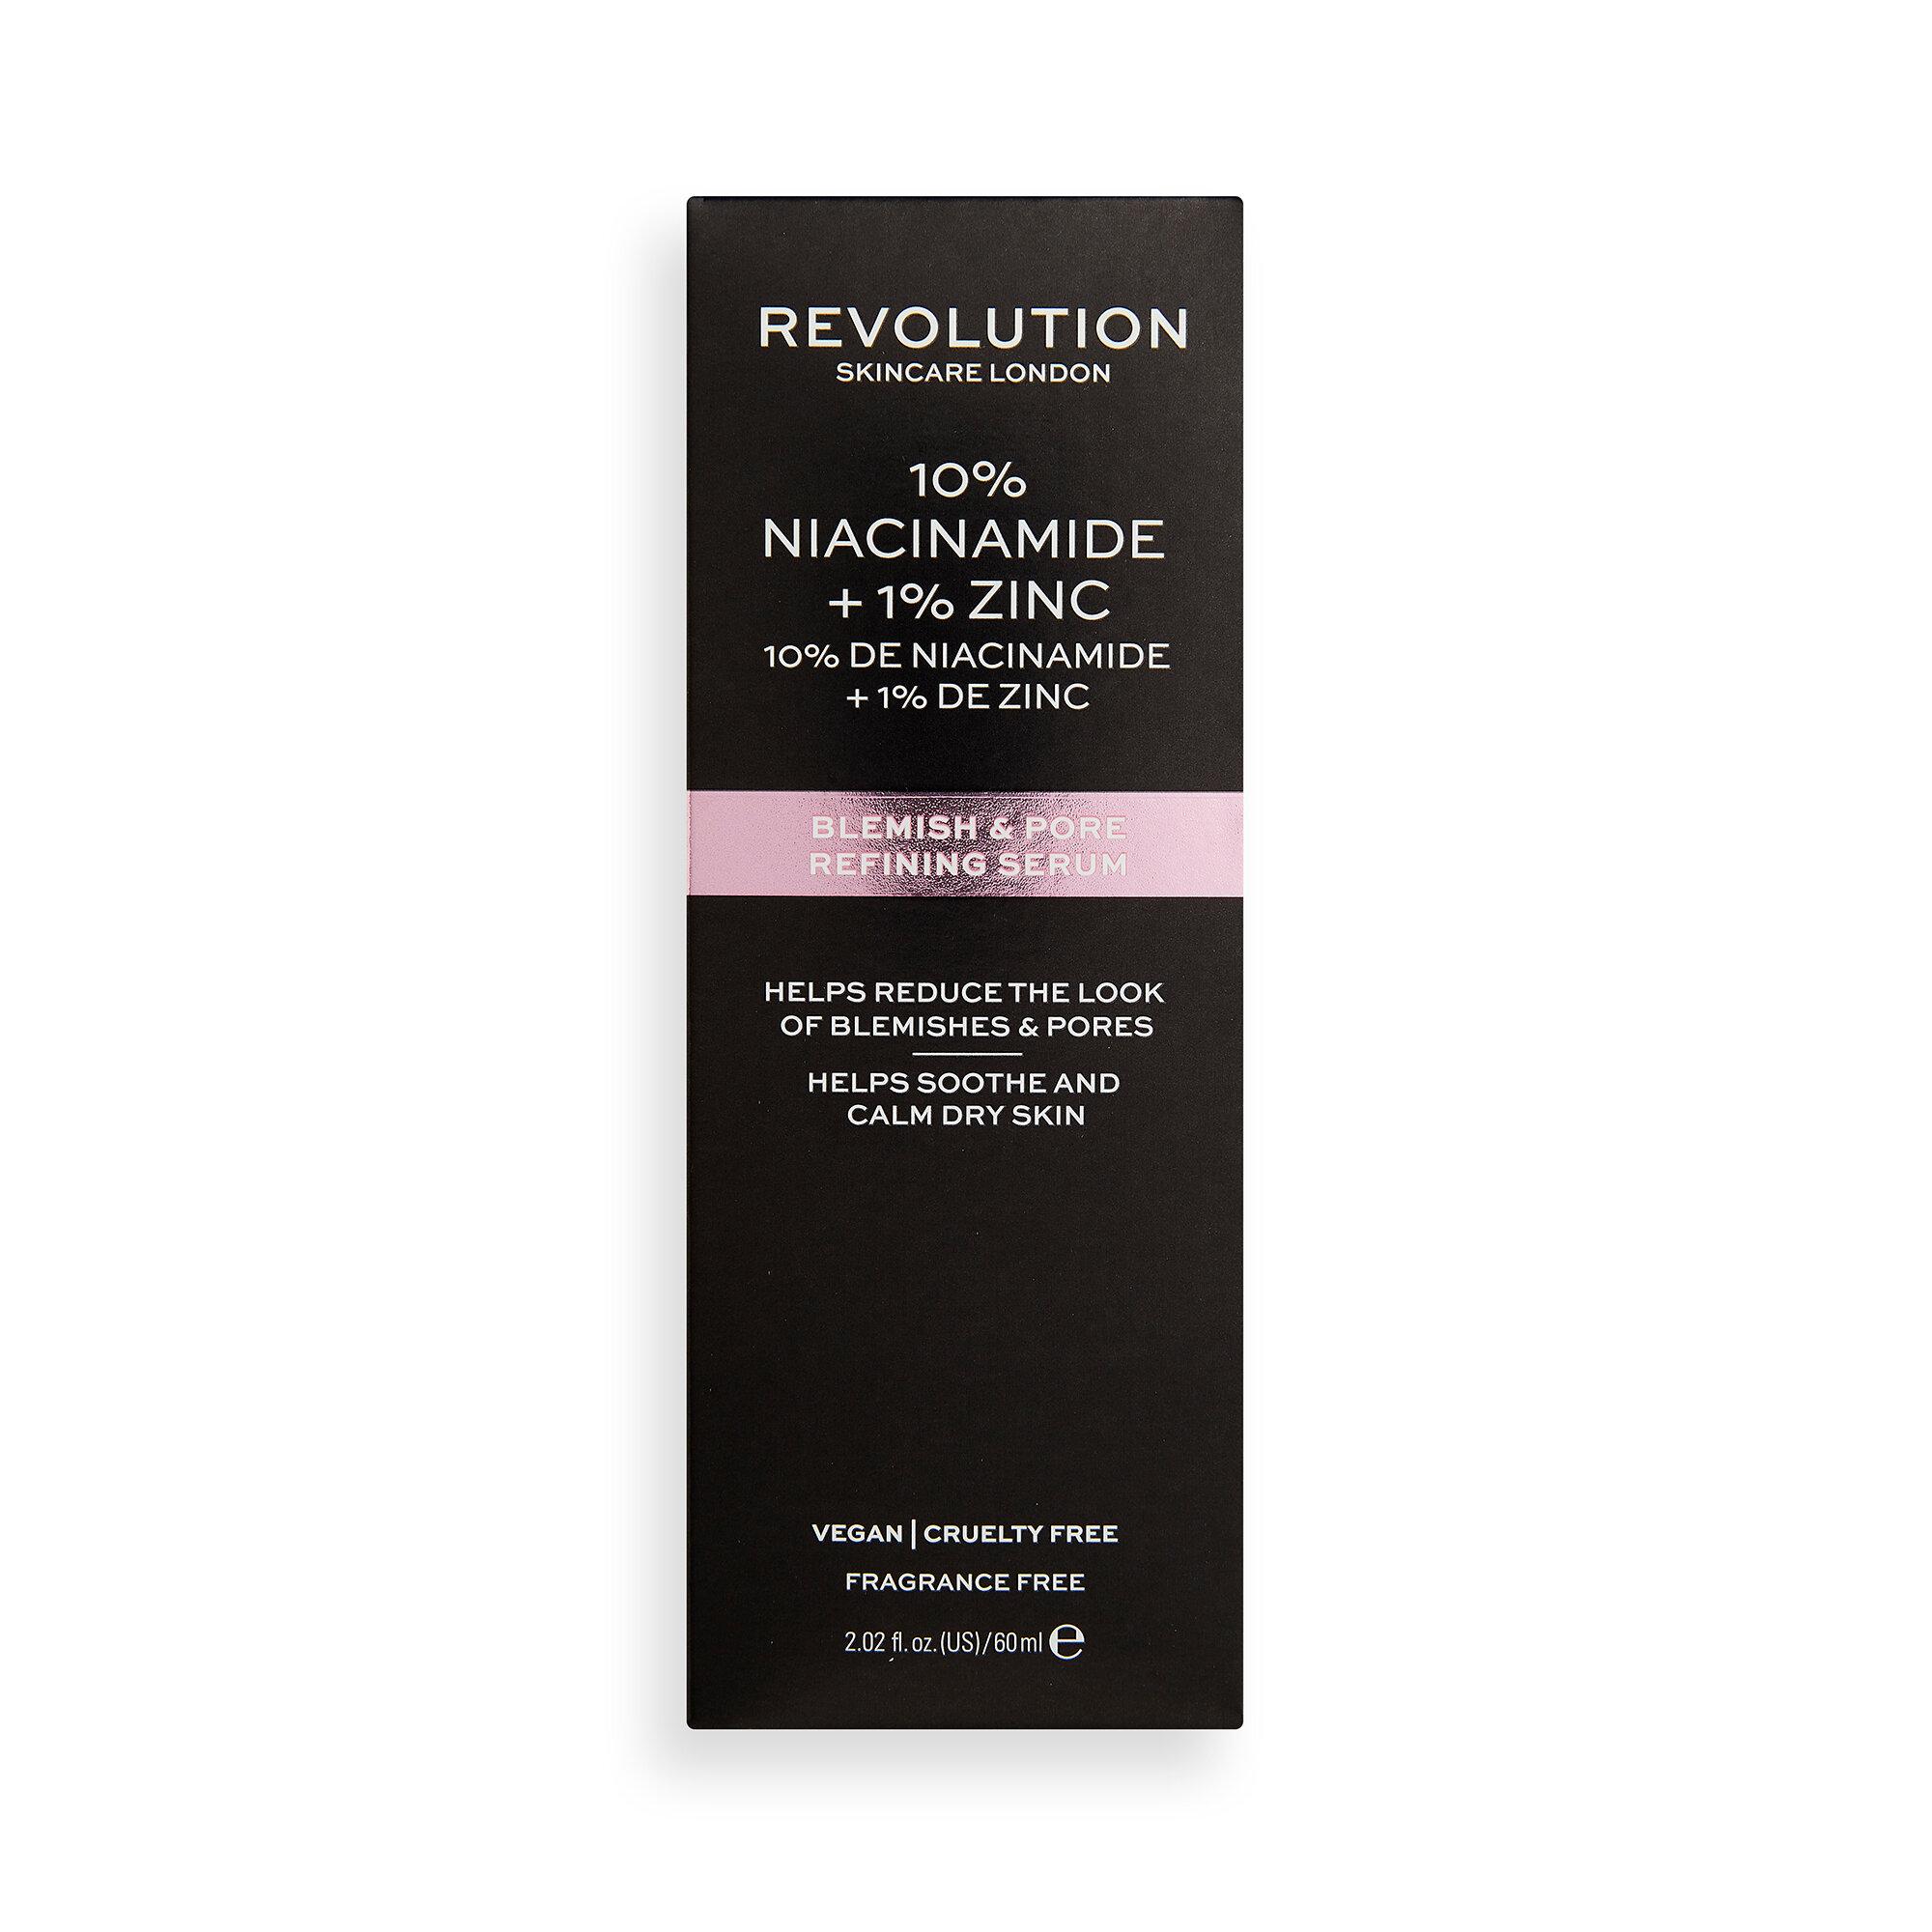 Revolution Skincare 10% Niacinamide and 1% Zinc Blemish & Pore Serum SUPER SIZED